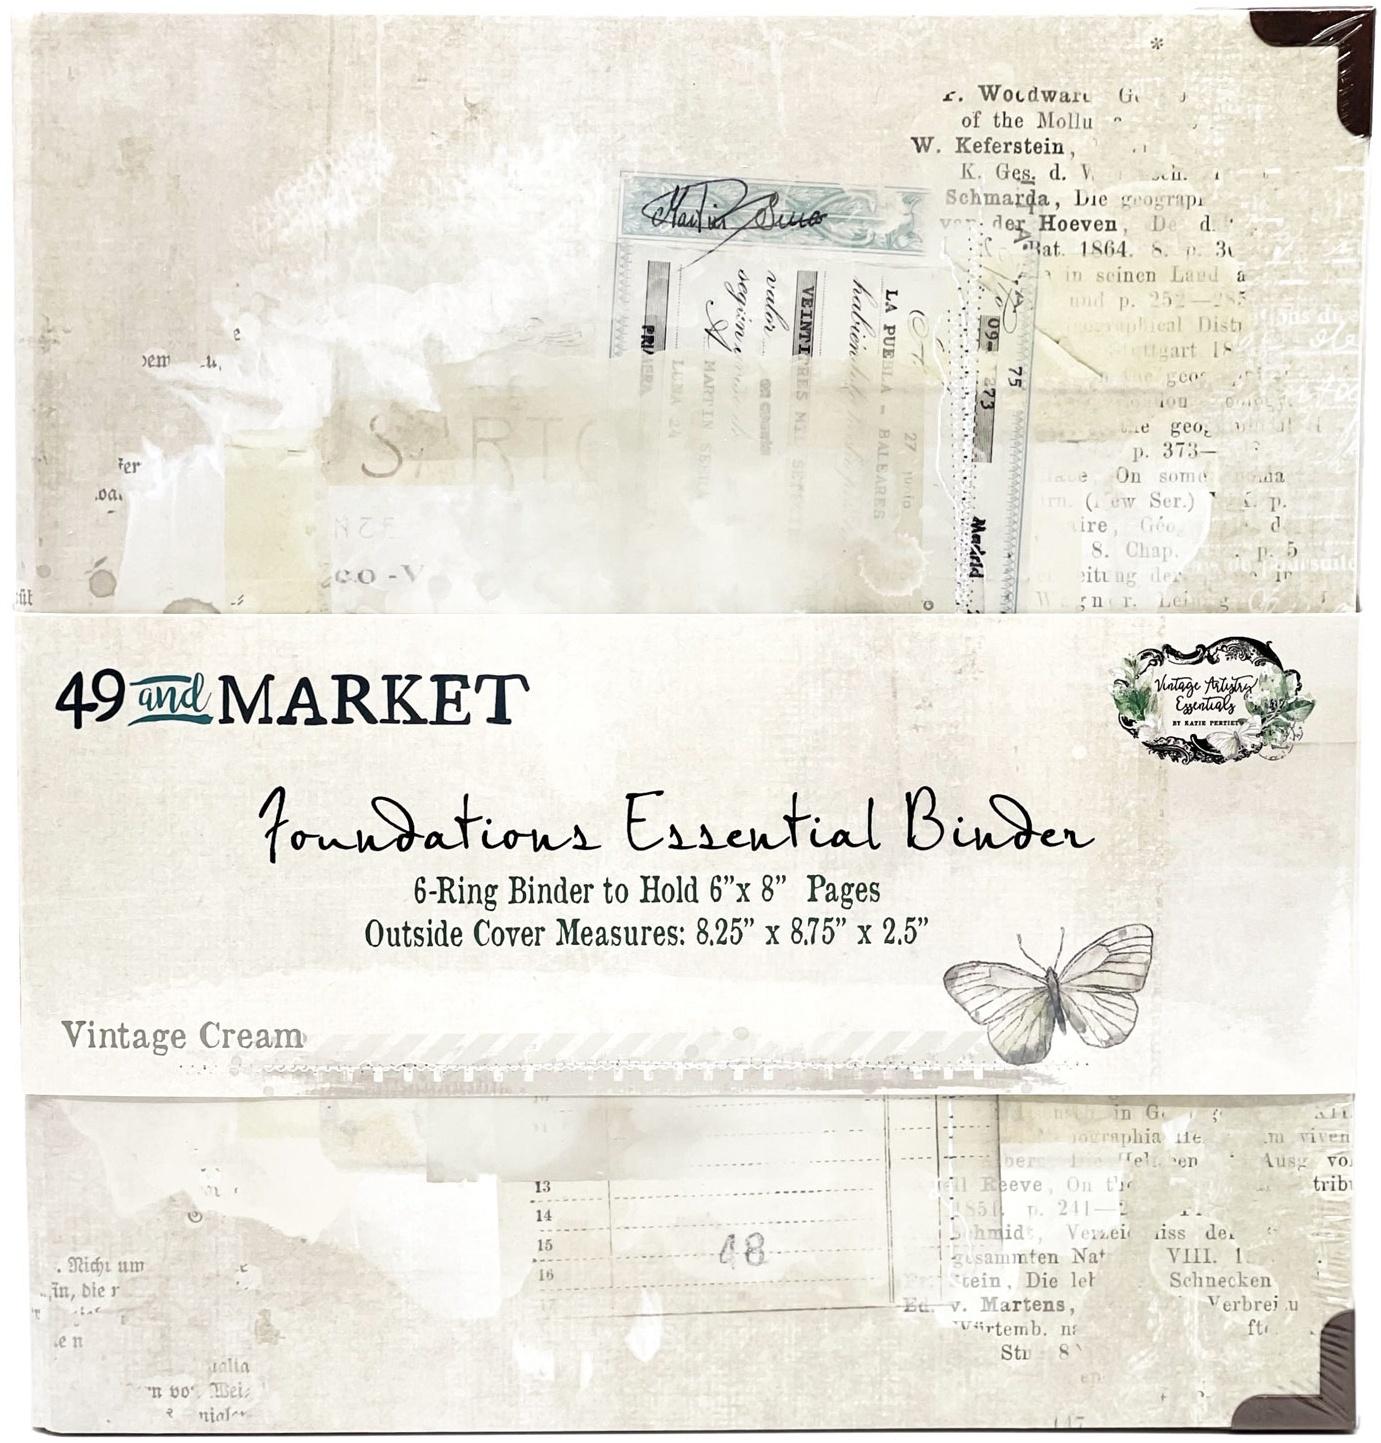 49 And Market Foundations Essential Binder-Vintage Cream